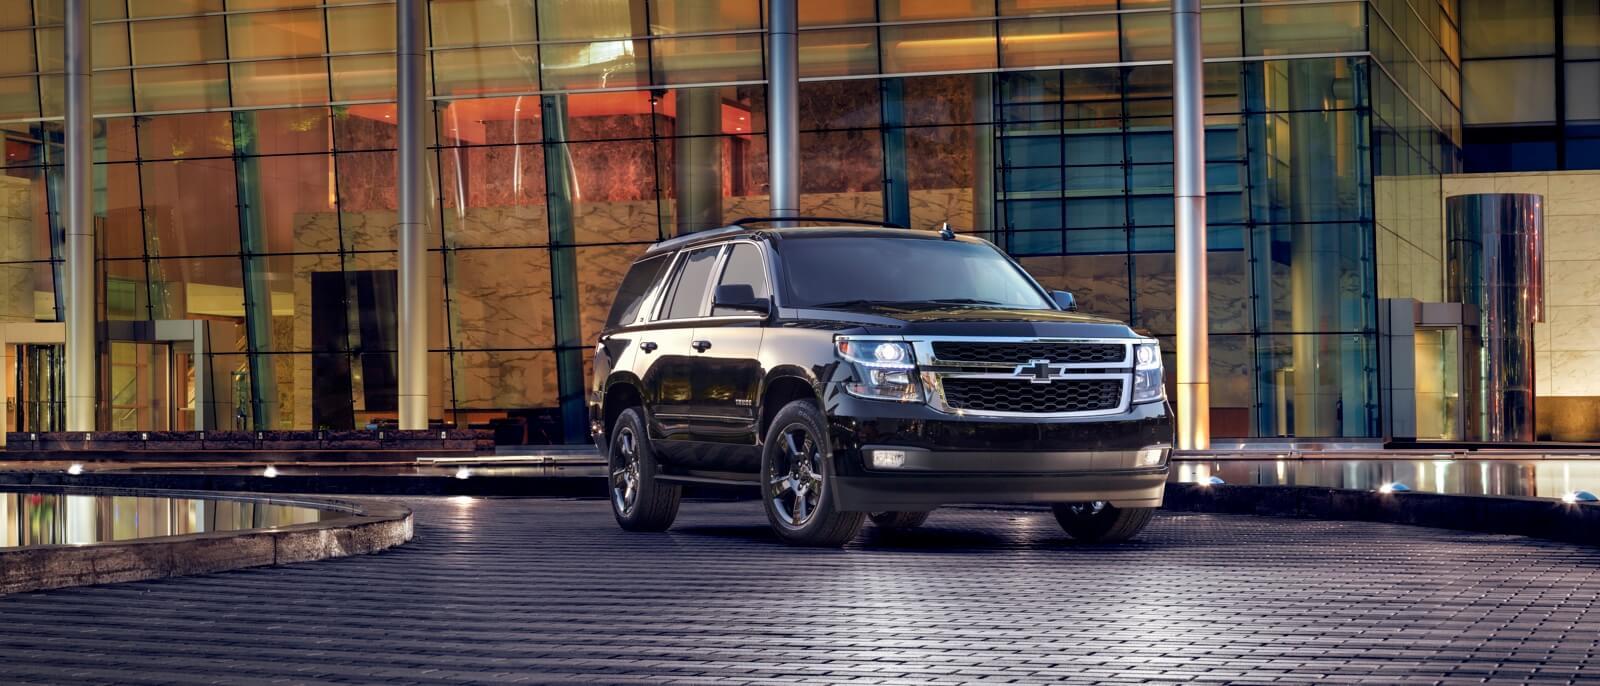 2017 Chevrolet Tahoe dark exterior